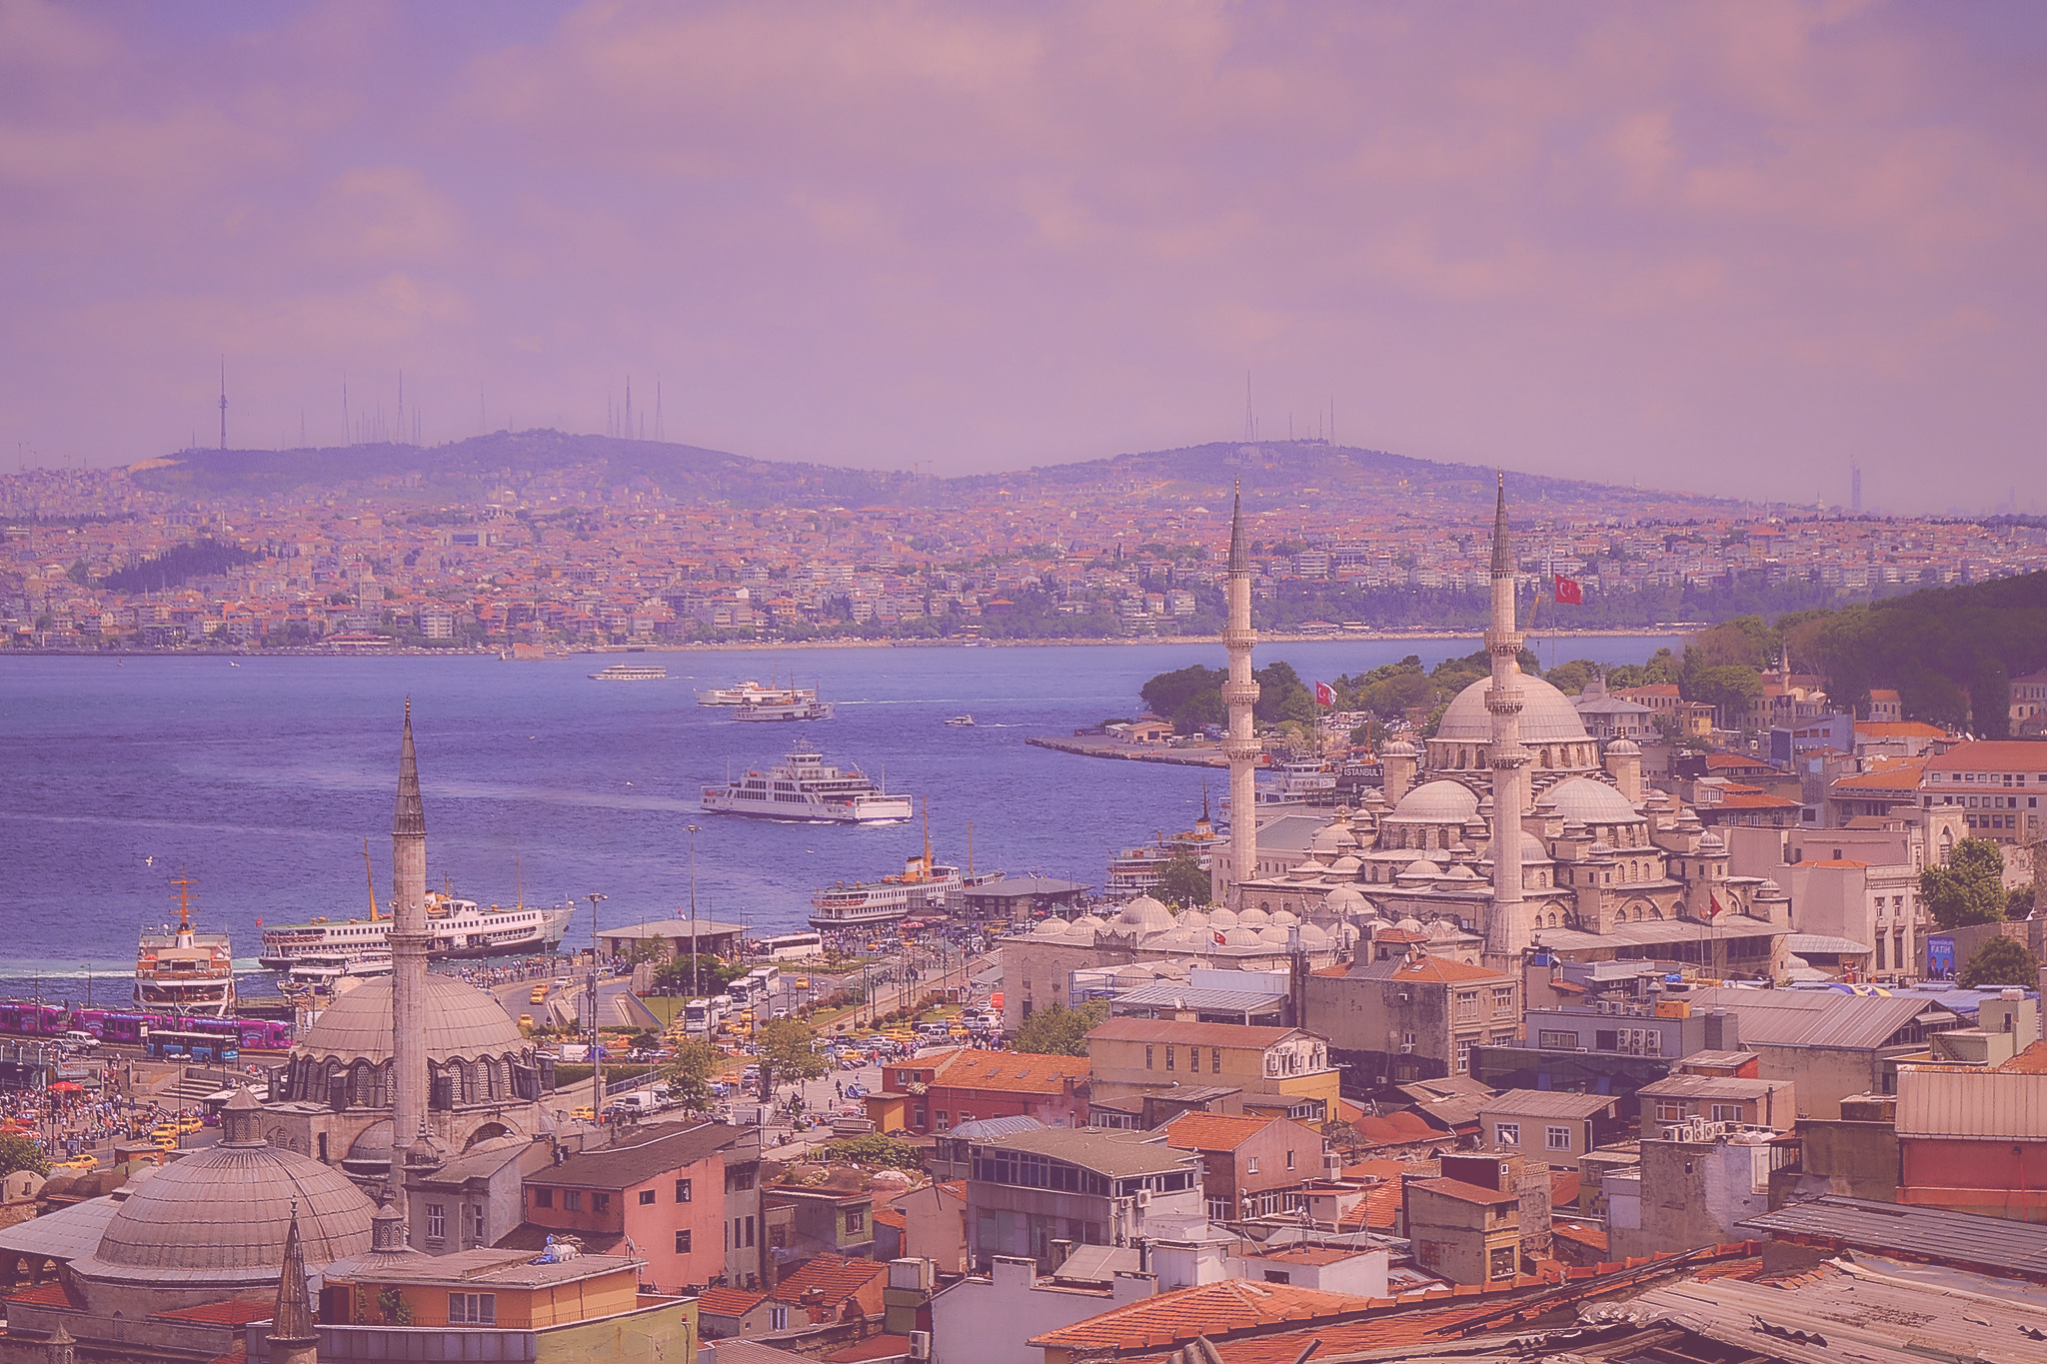 Gülçin Balamir Coşkun – Media capture strategies in new authoritarian states: the case of Turkey